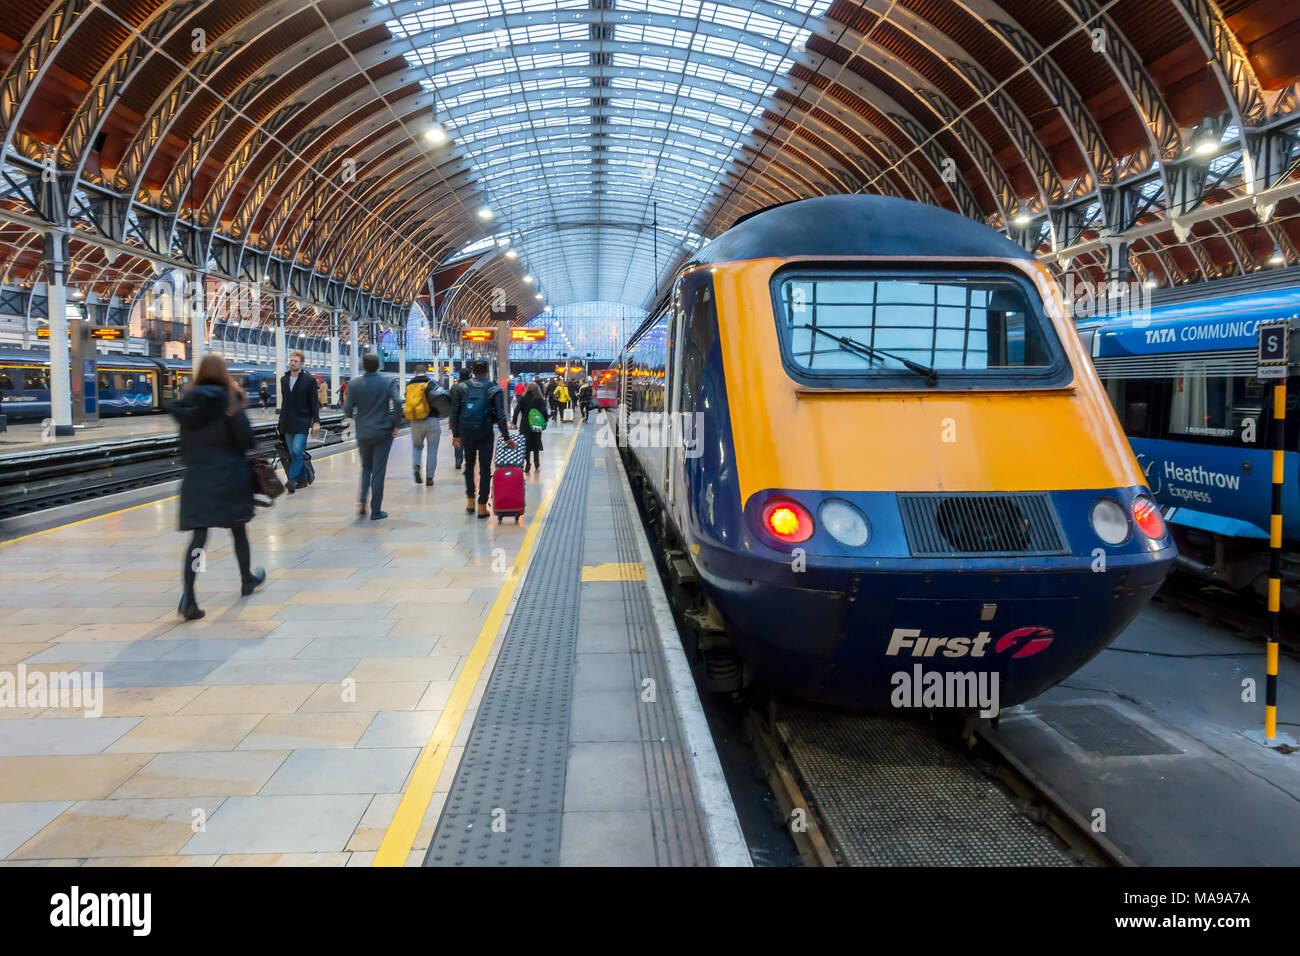 trains-sit-at-the-platform-at-paddington-railway-station-in-london-uk-MA9A7A.jpg